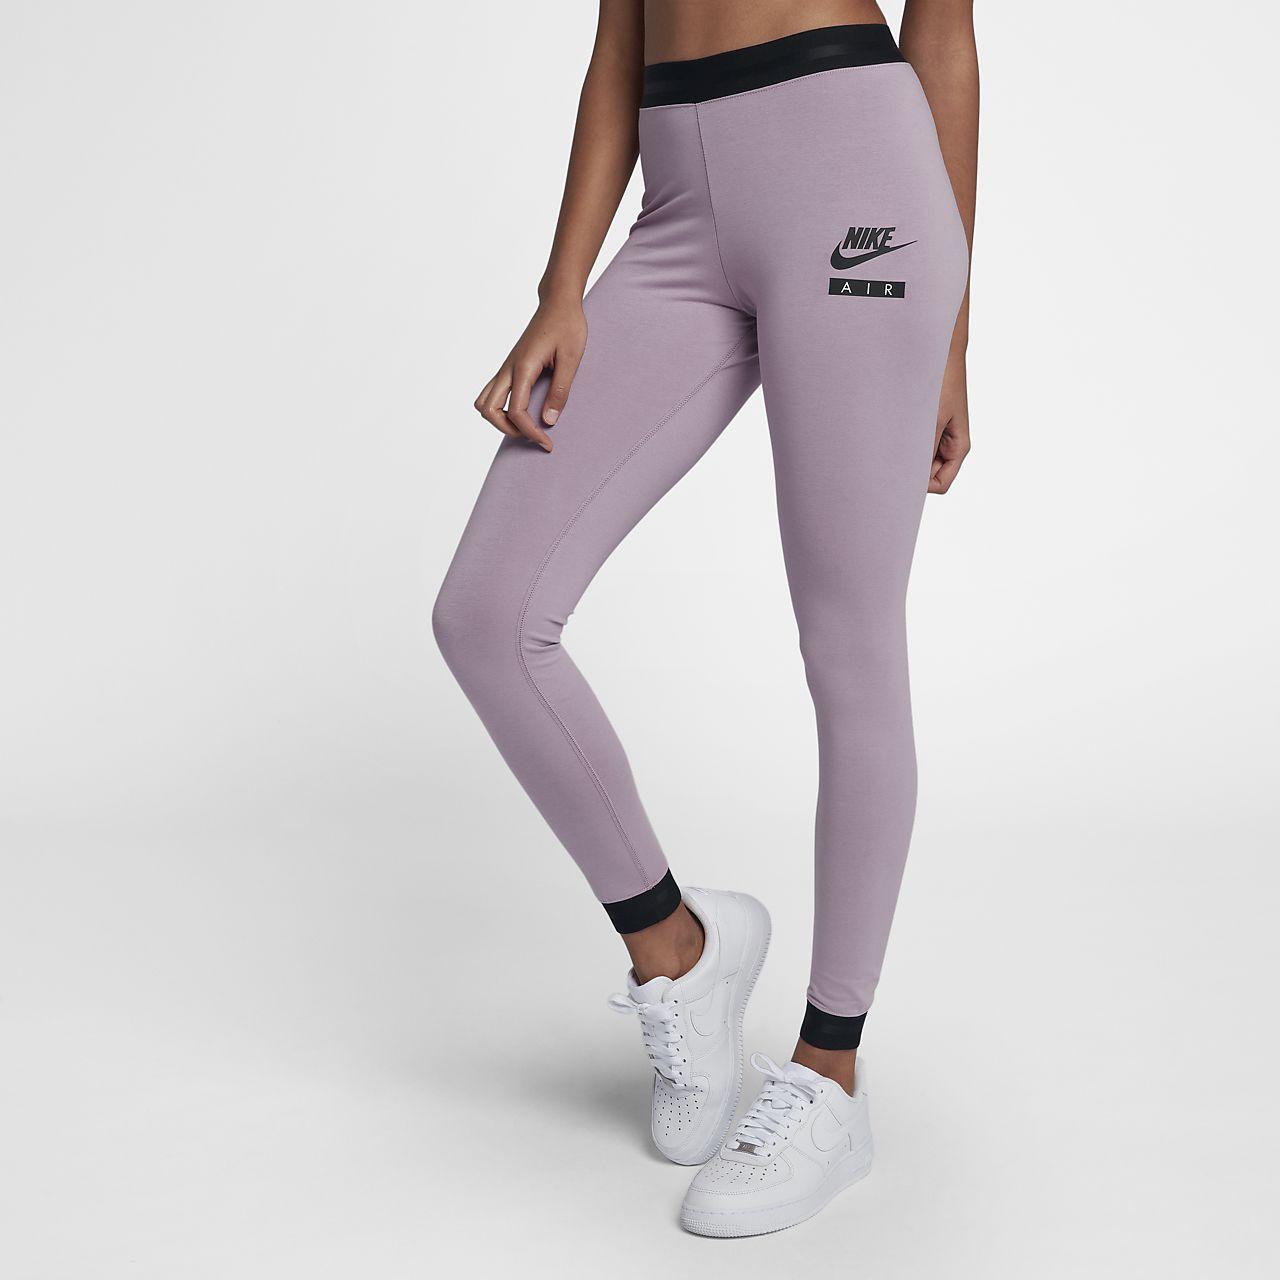 75c29b3f3ae0b Air Women's High-Waisted Leggings | Clothing | Leggings, Nike air, Nike